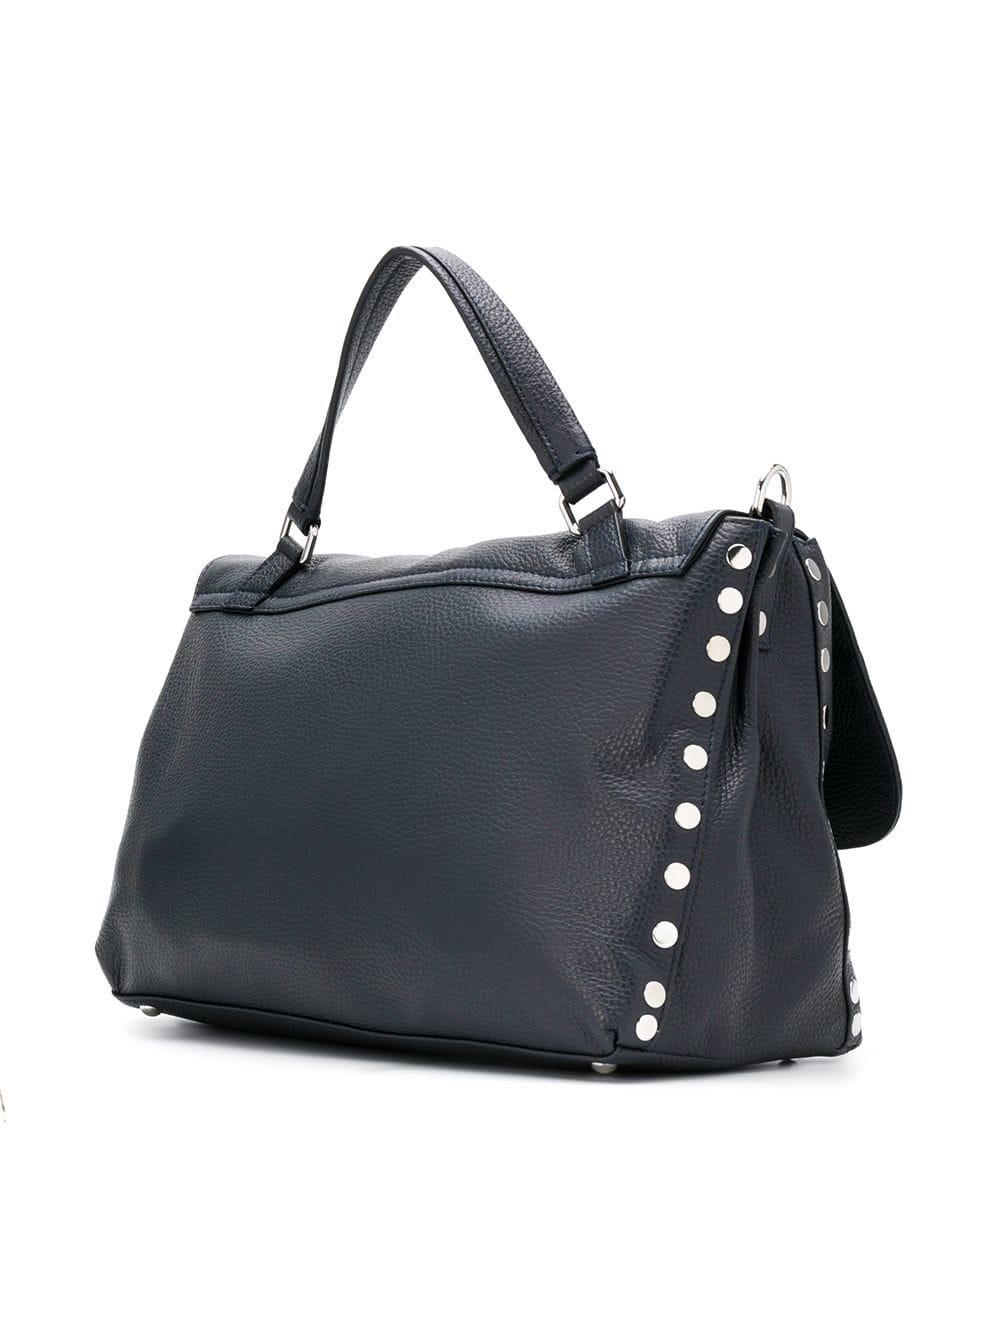 9a64caff57 zanellato POSTINA BAG available on montiboutique.com - 25616